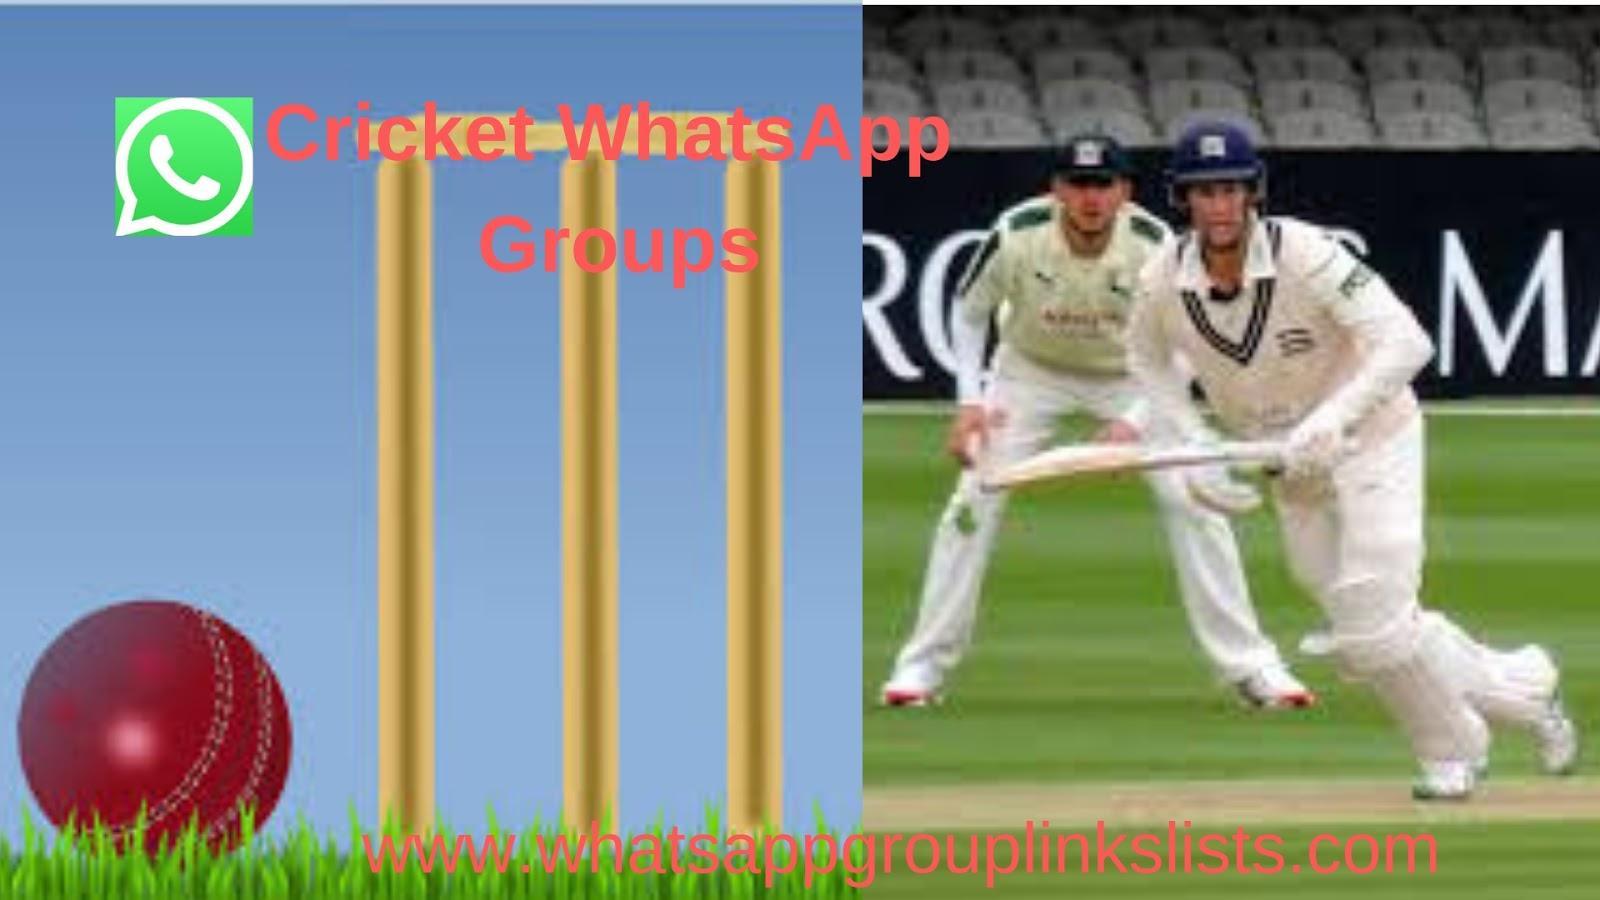 Join Cricket WhatsApp Group Links list